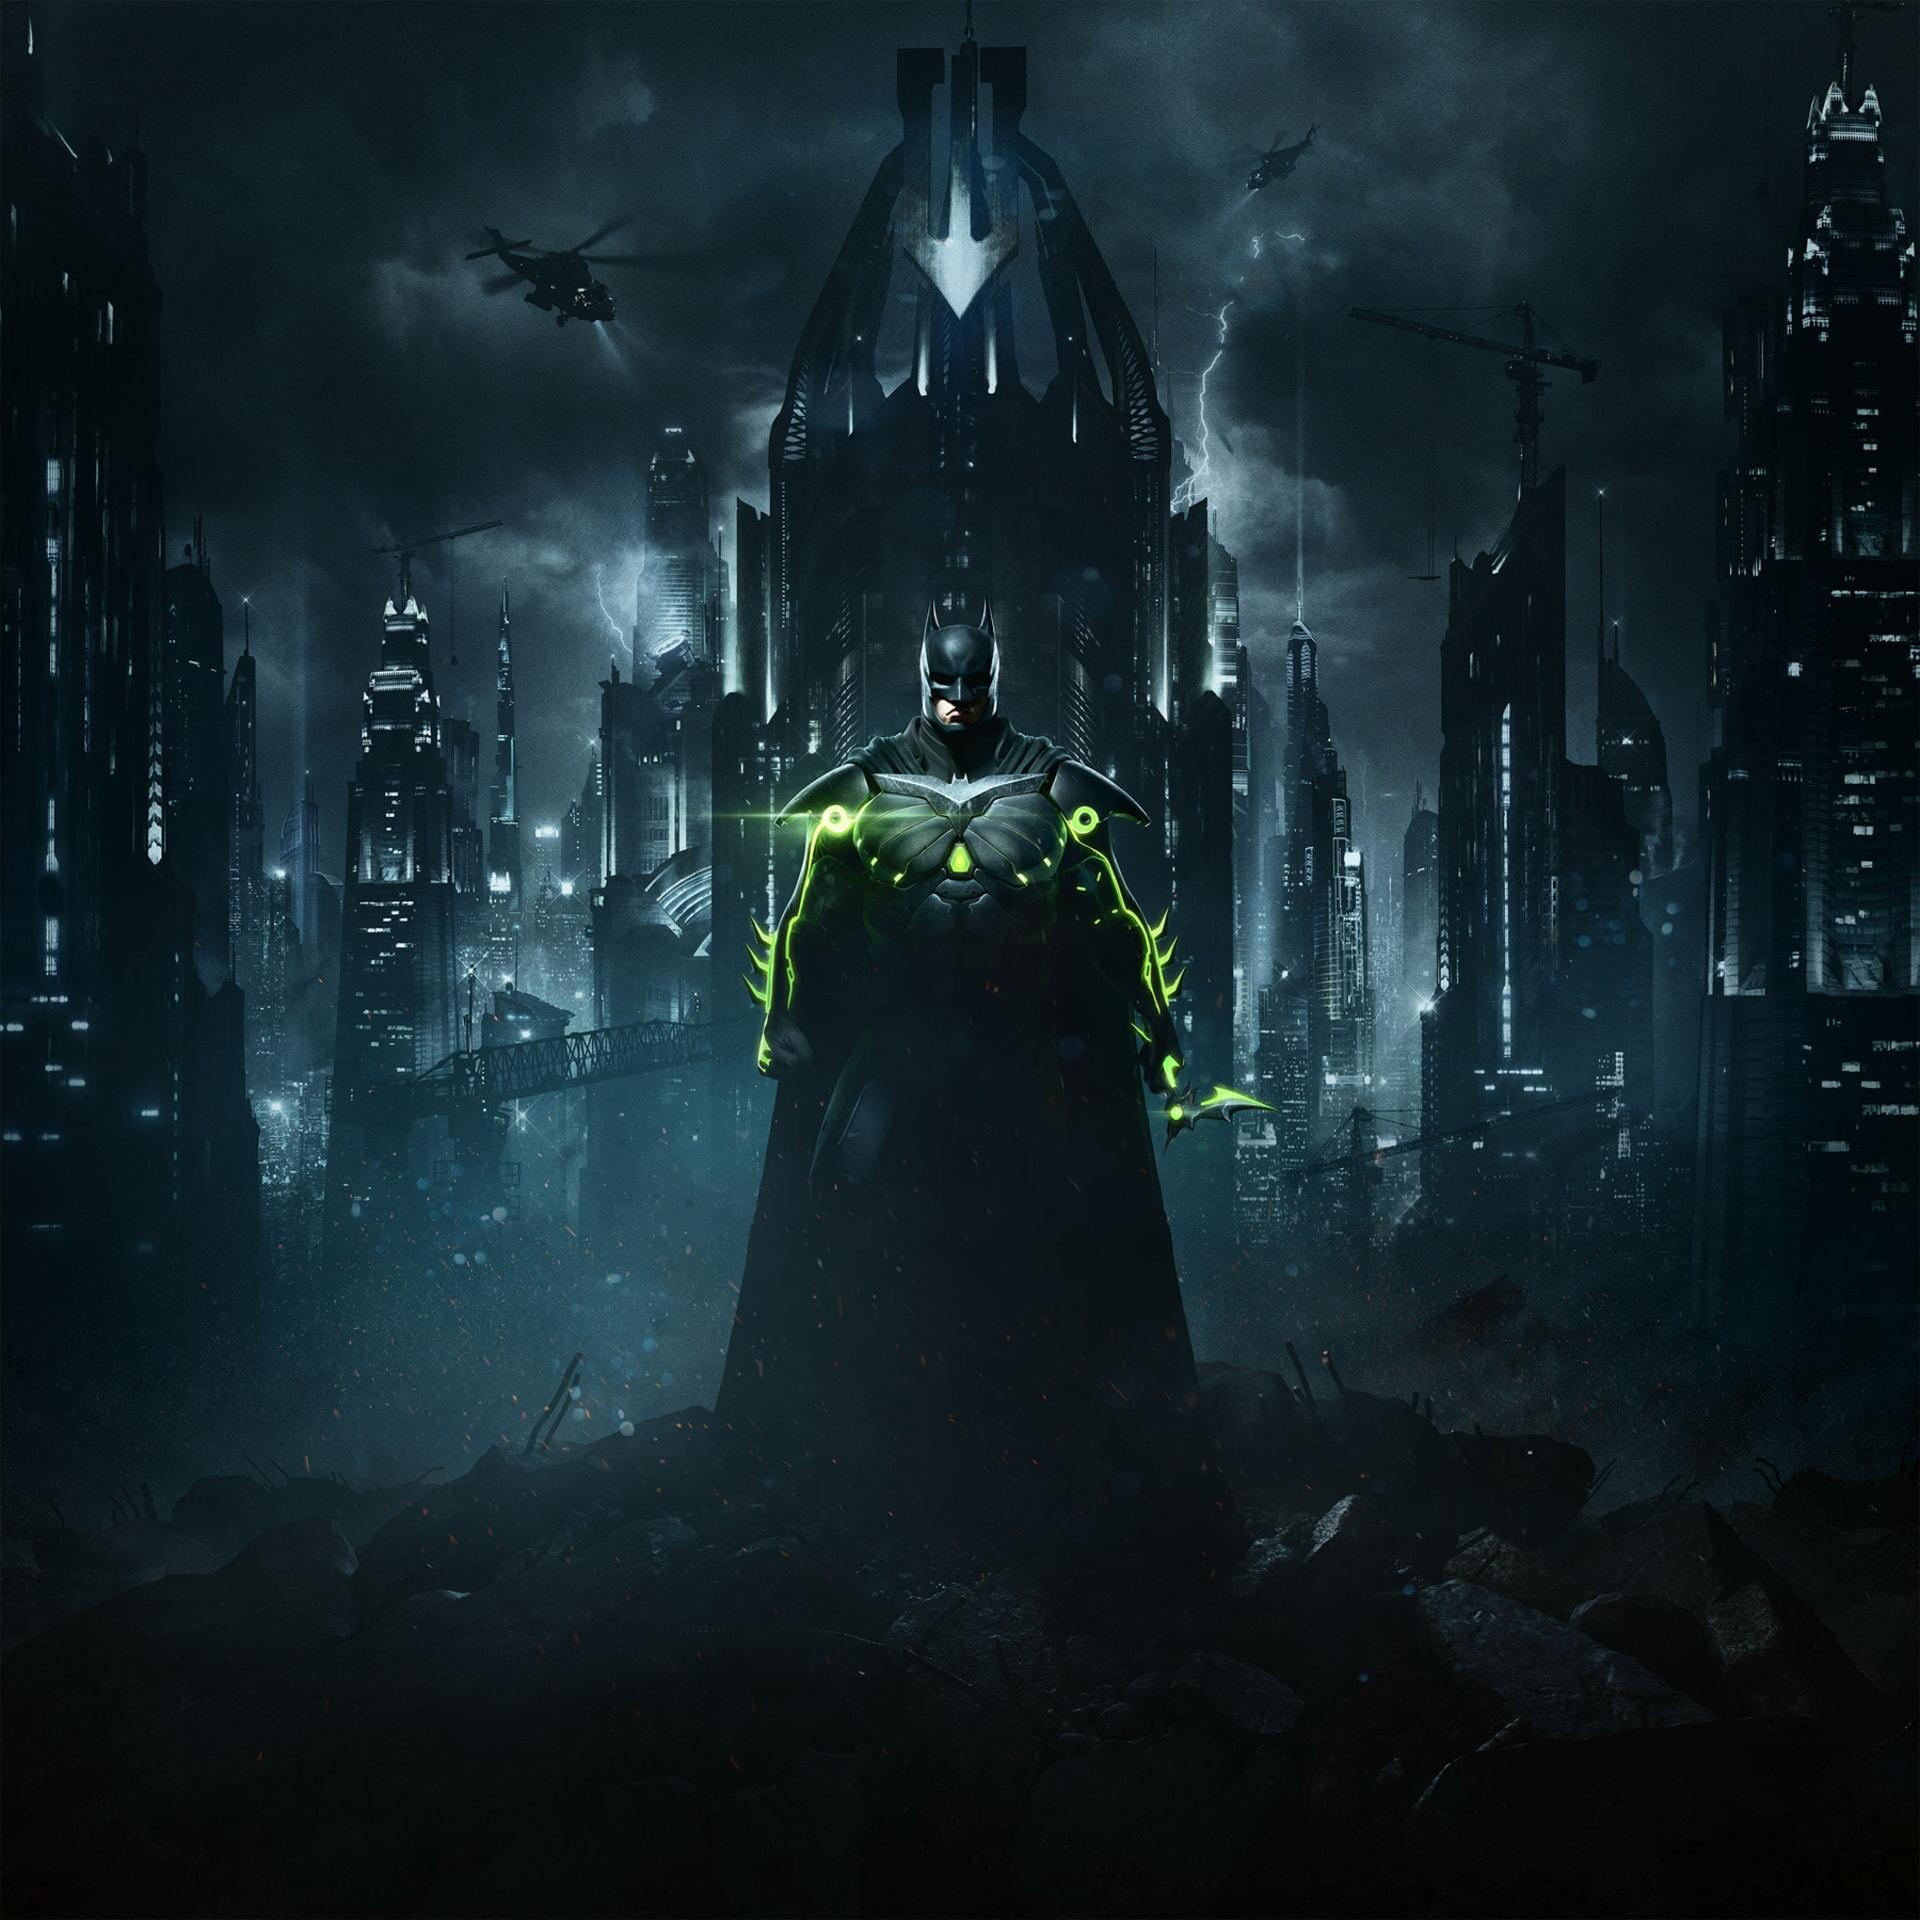 Injustice 2: Batman in Gotham City